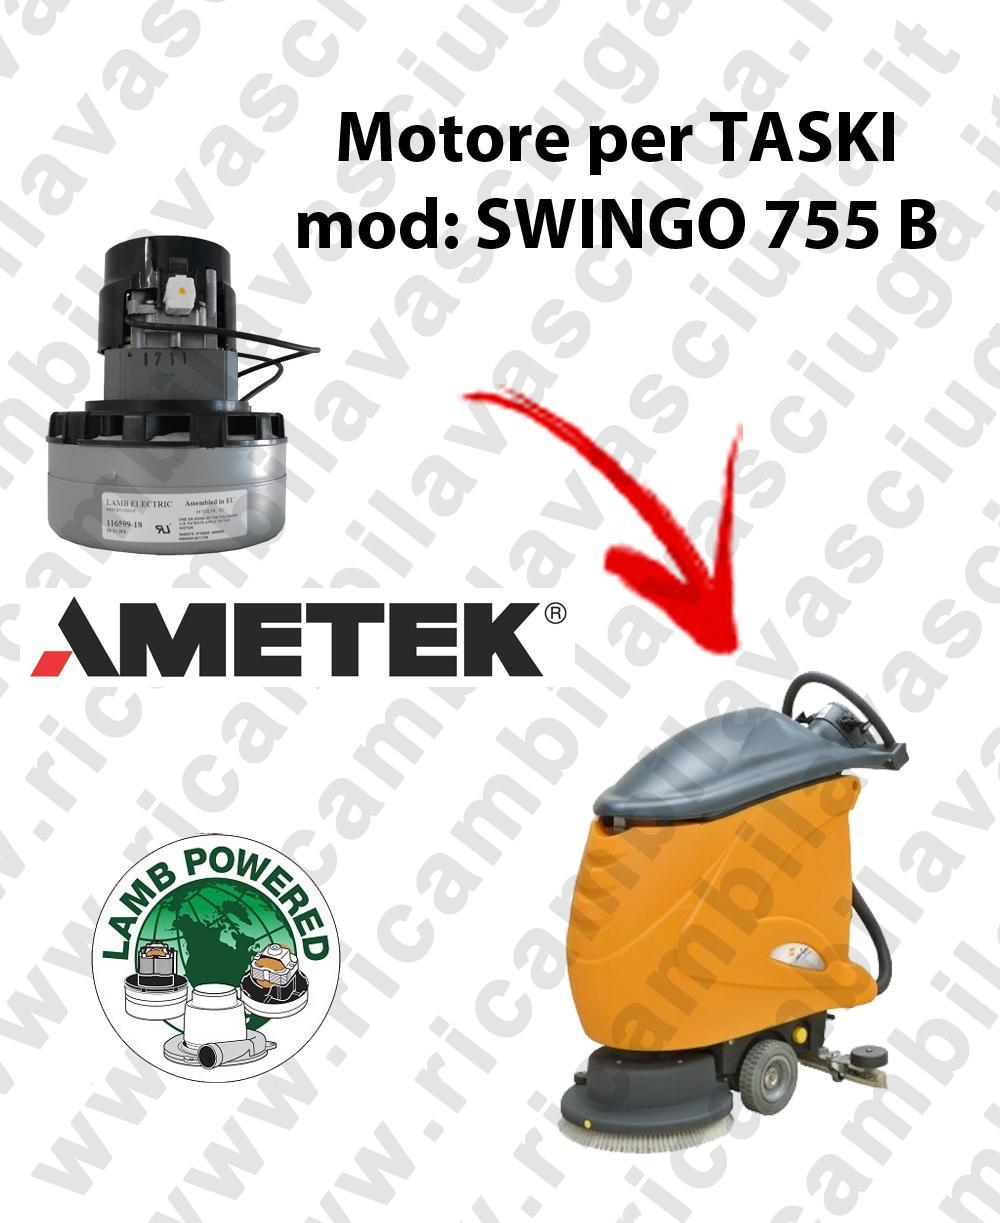 SWINGO 755 B MOTORE LAMB AMETEK di aspirazione per lavapavimenti TASKI